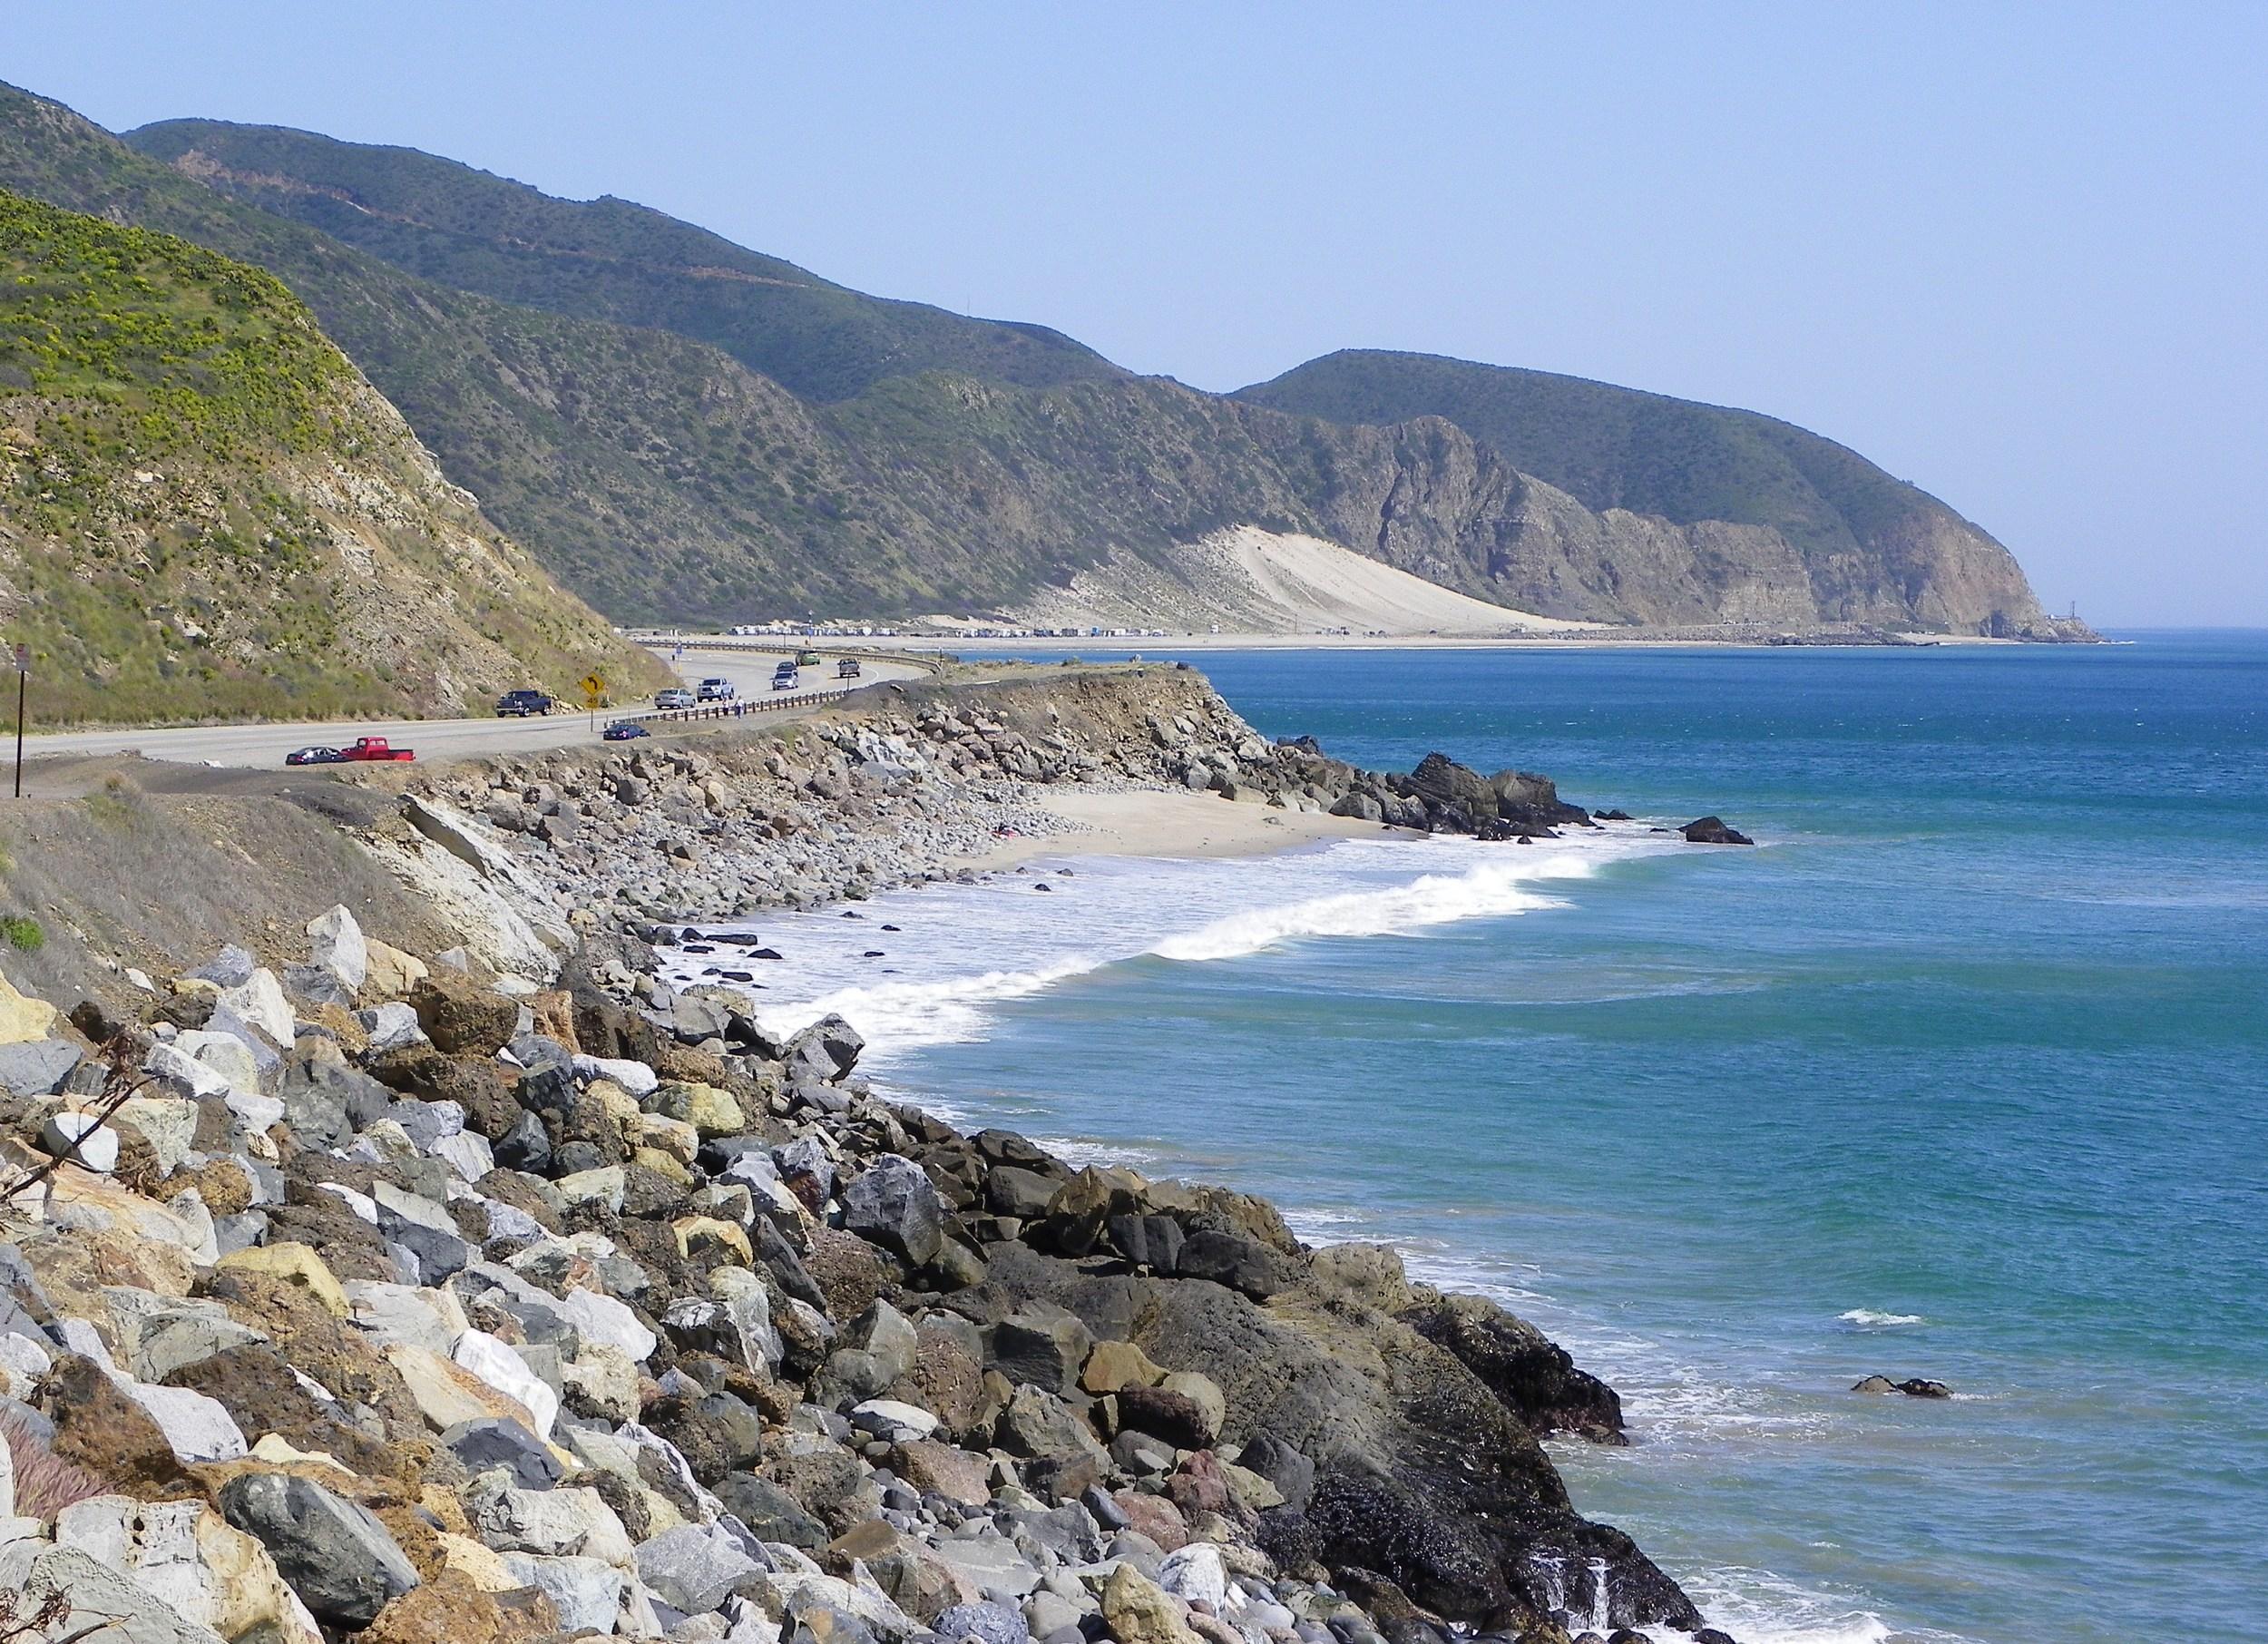 Ventura County Coastline Just South of Pt. Mugu